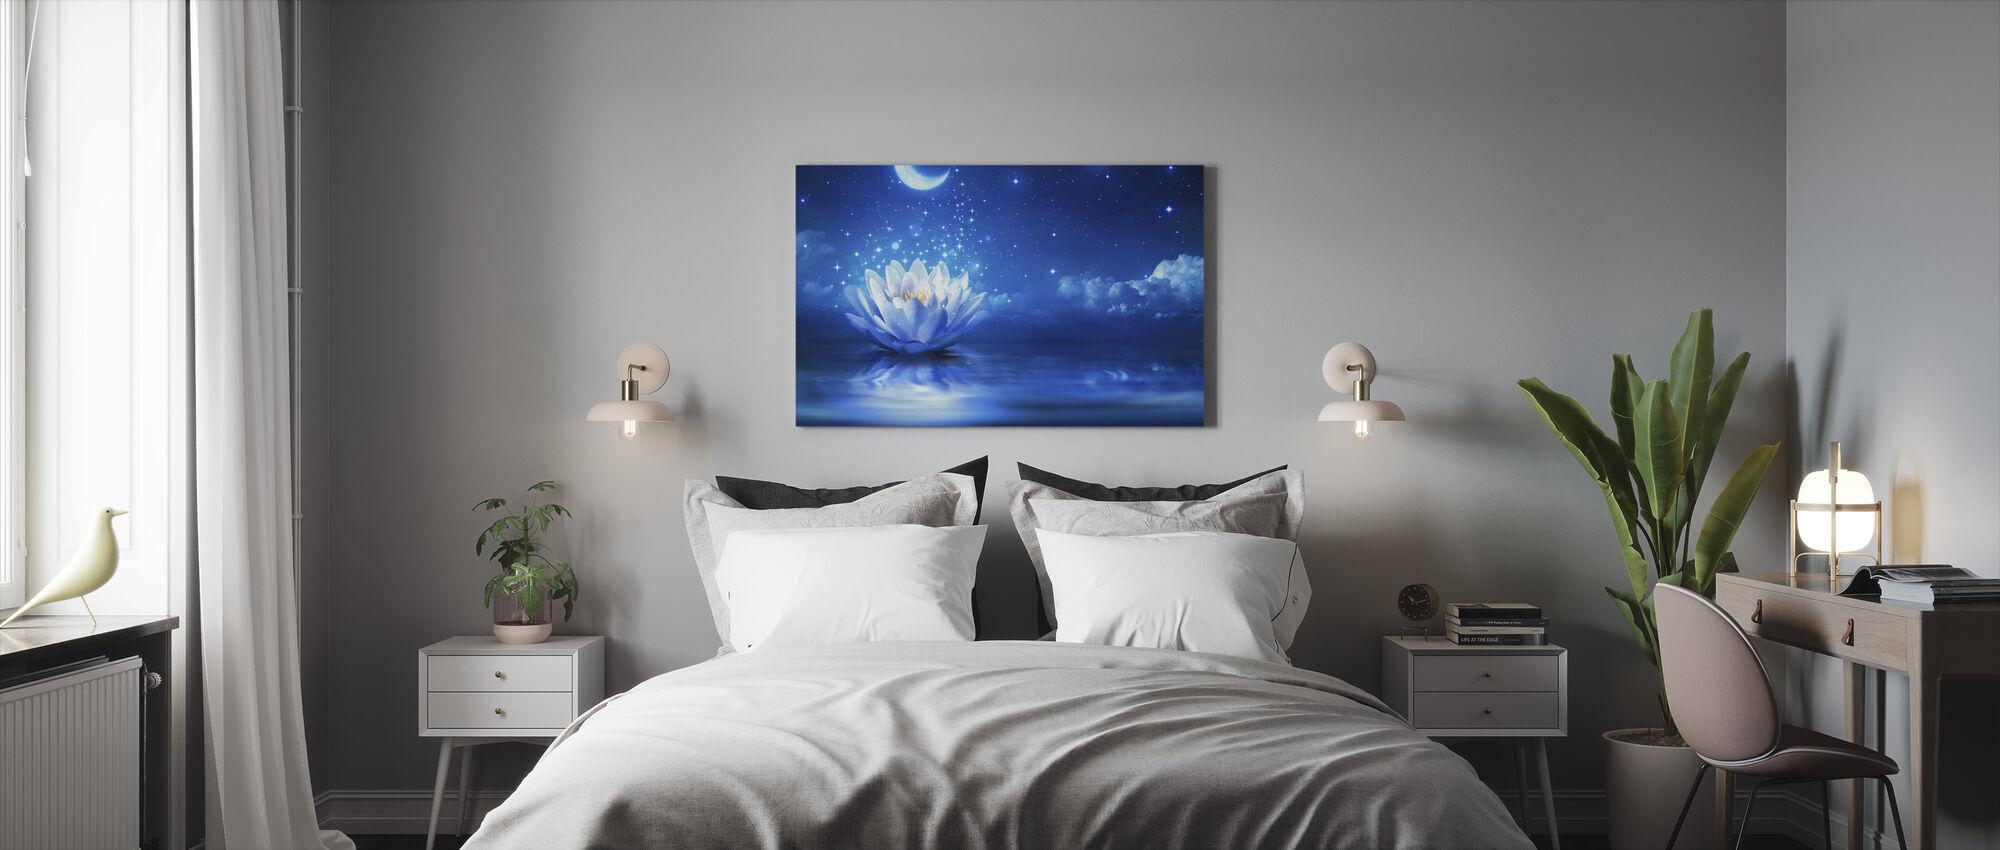 Waterlily Moon - Canvas print - Bedroom